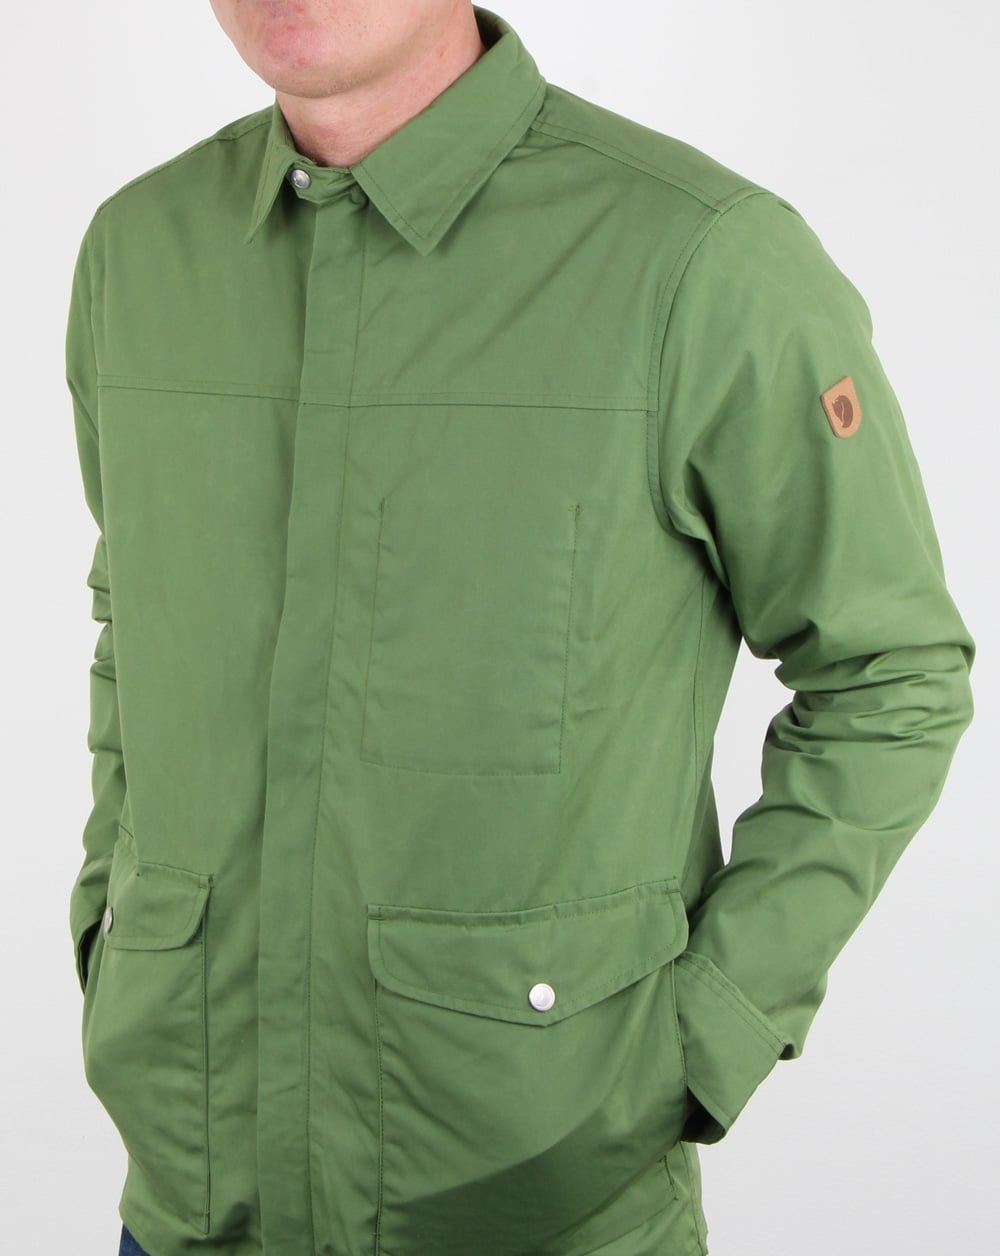 Fjallraven Greenland Shirt Jacket Fern, Mens, Shirt, Jacket, Pockets